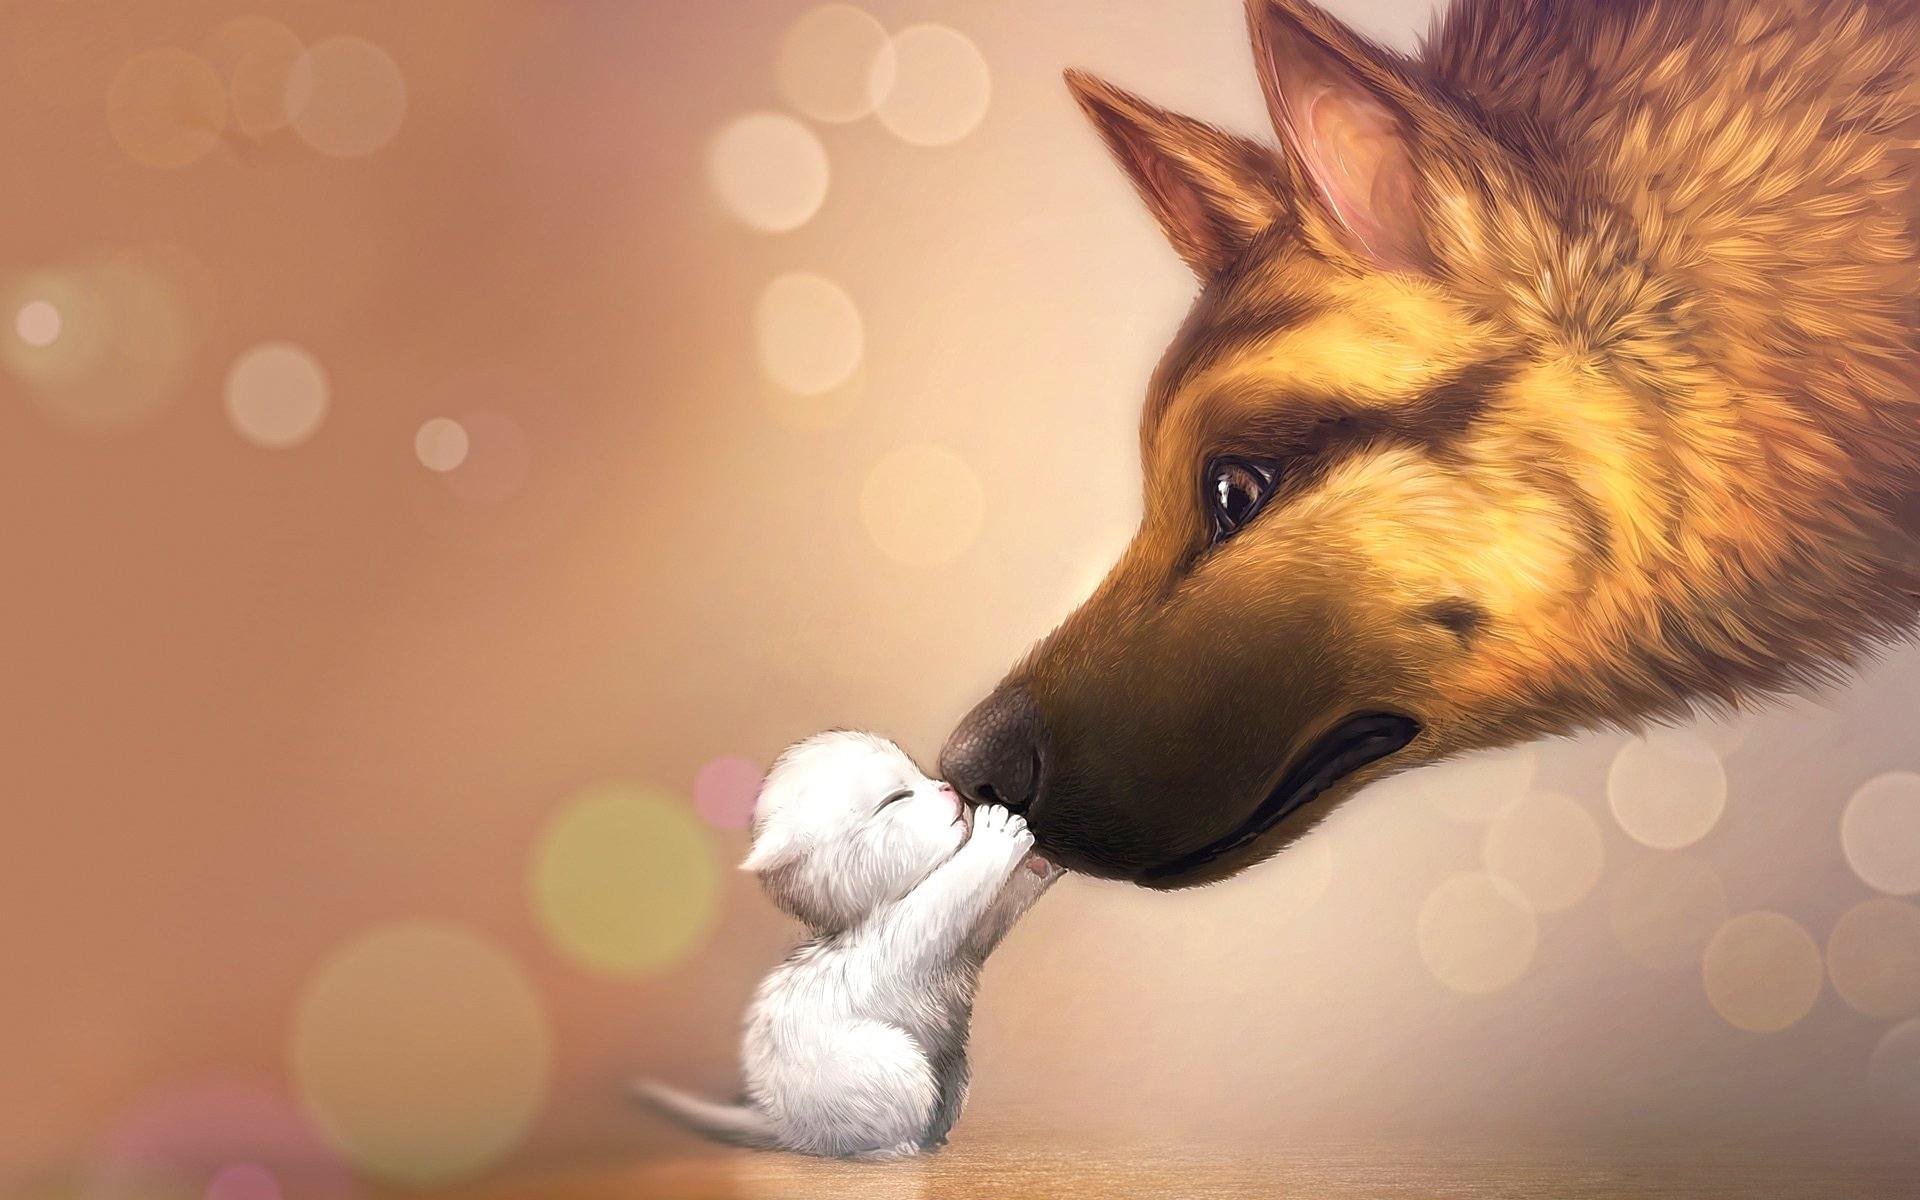 pin Drawn wallpaper cute animated animal #13